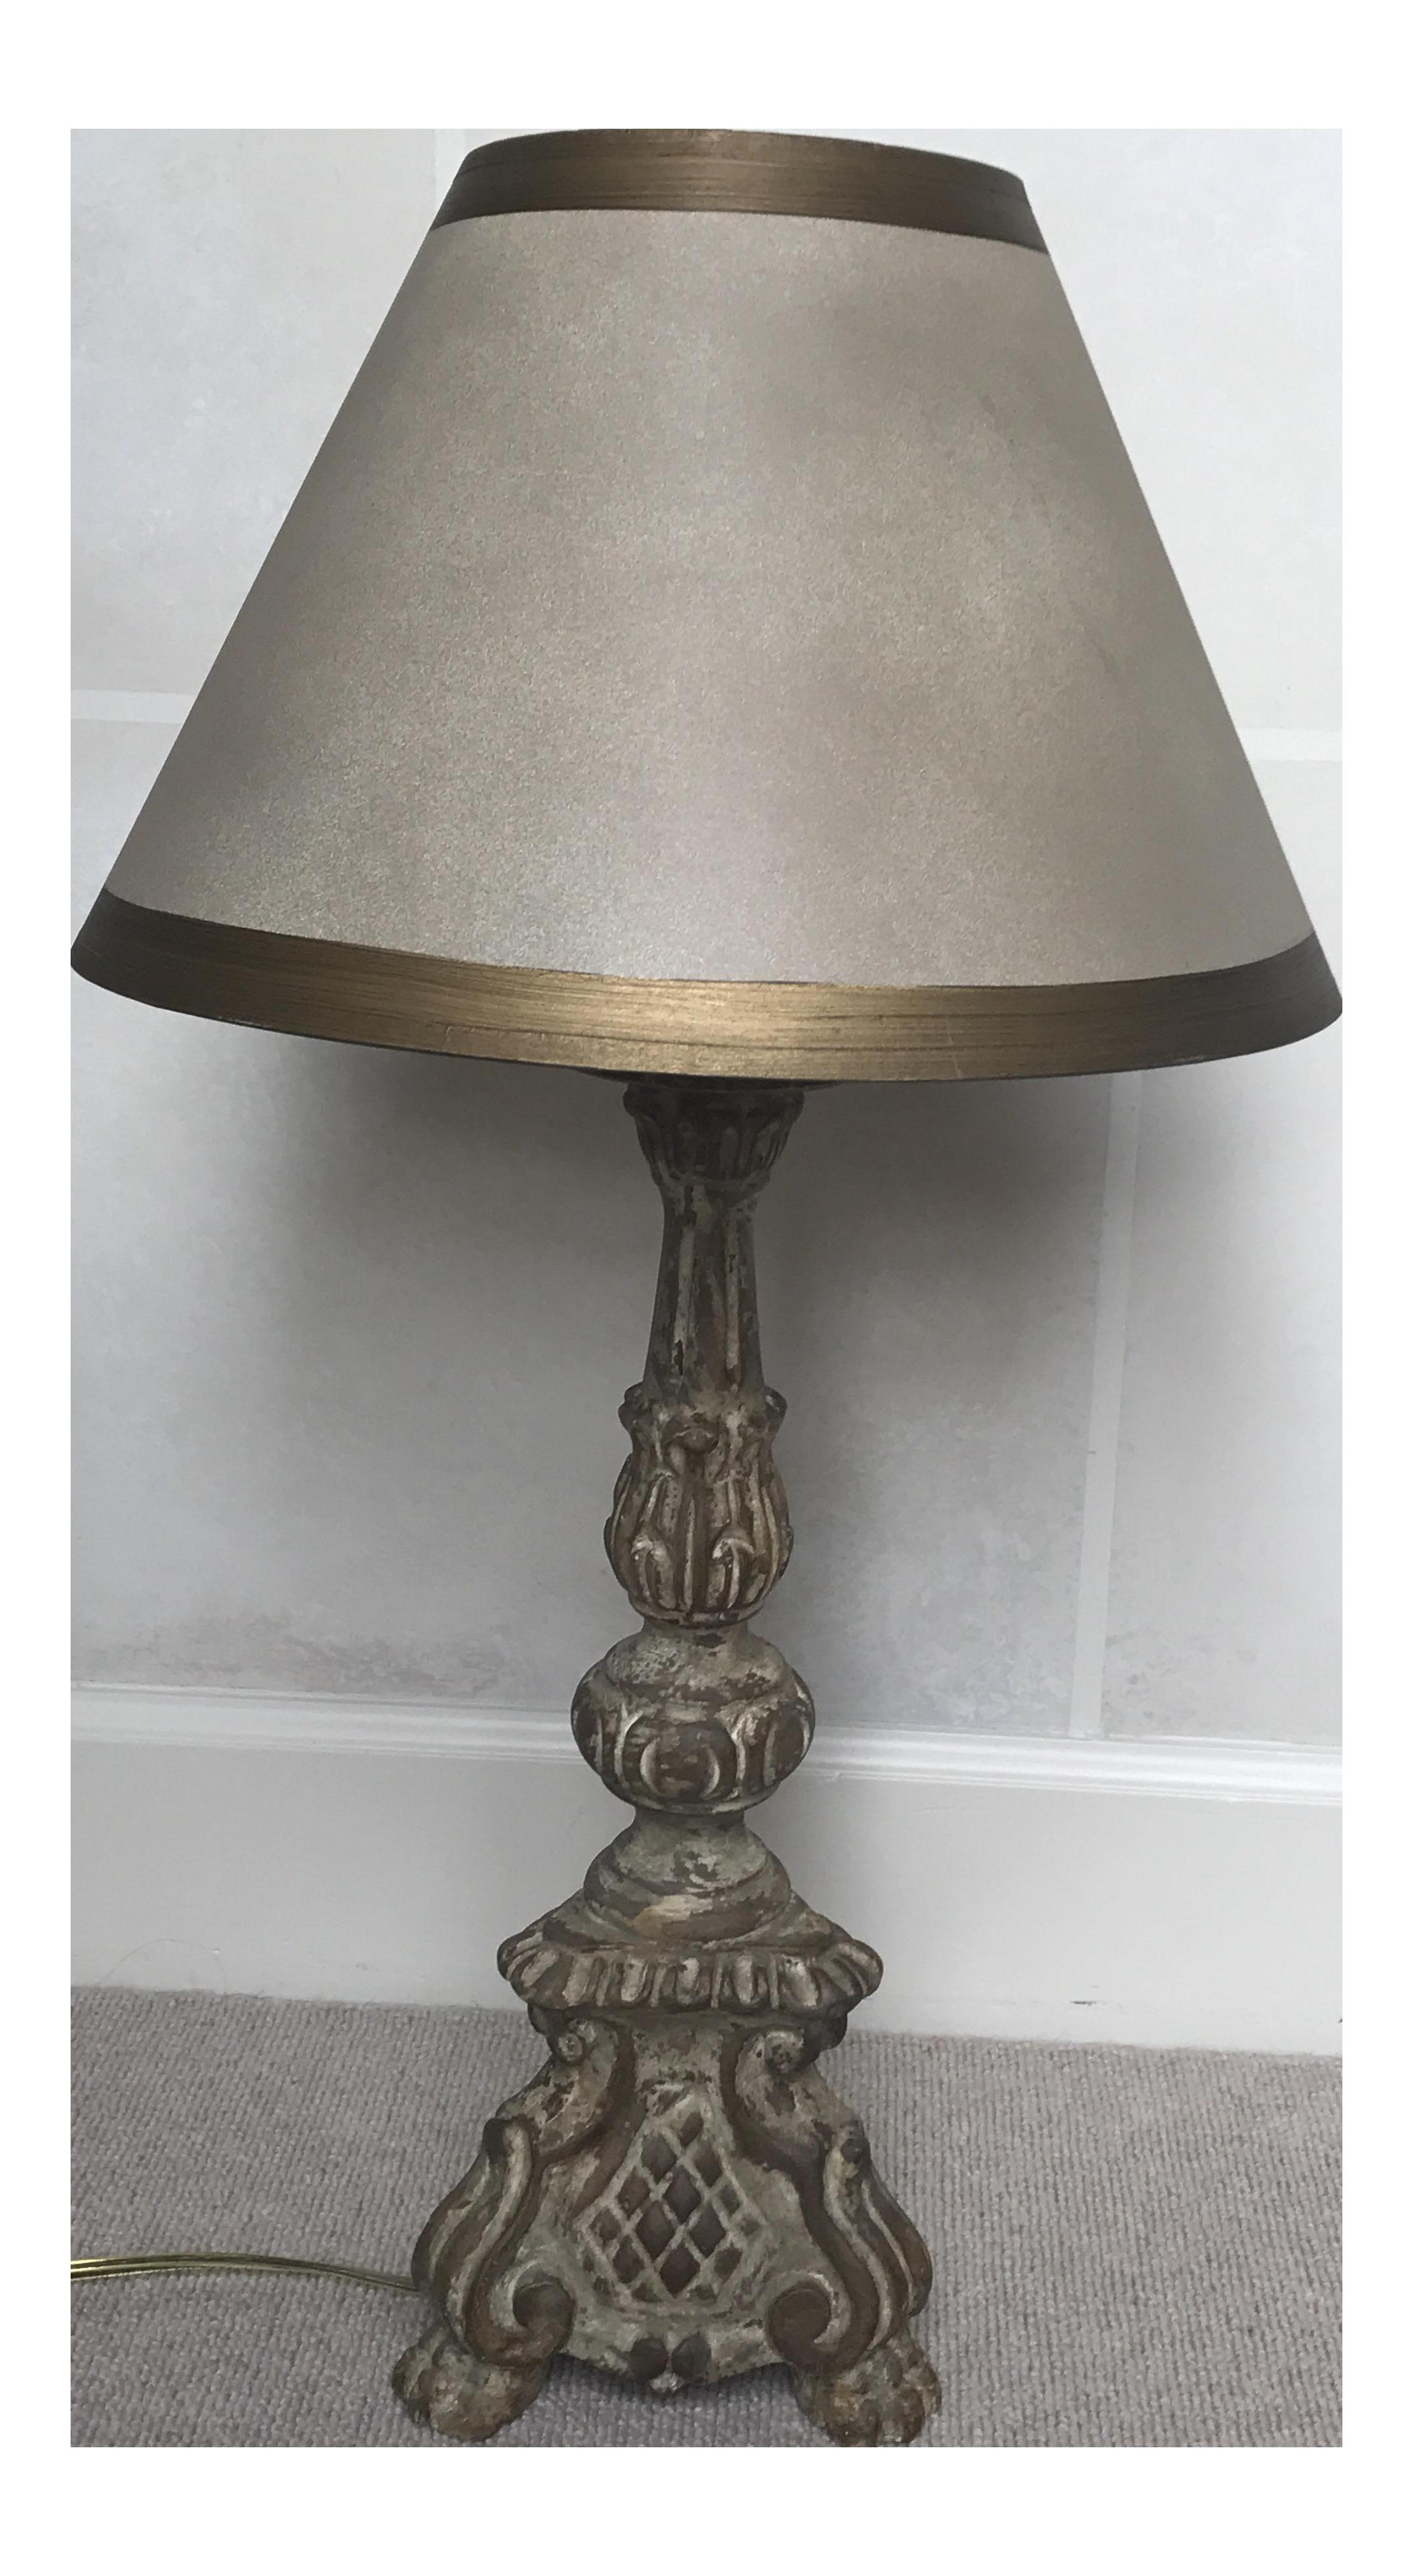 image protoblogr for lamps design candlestick lamp decoration buffet of